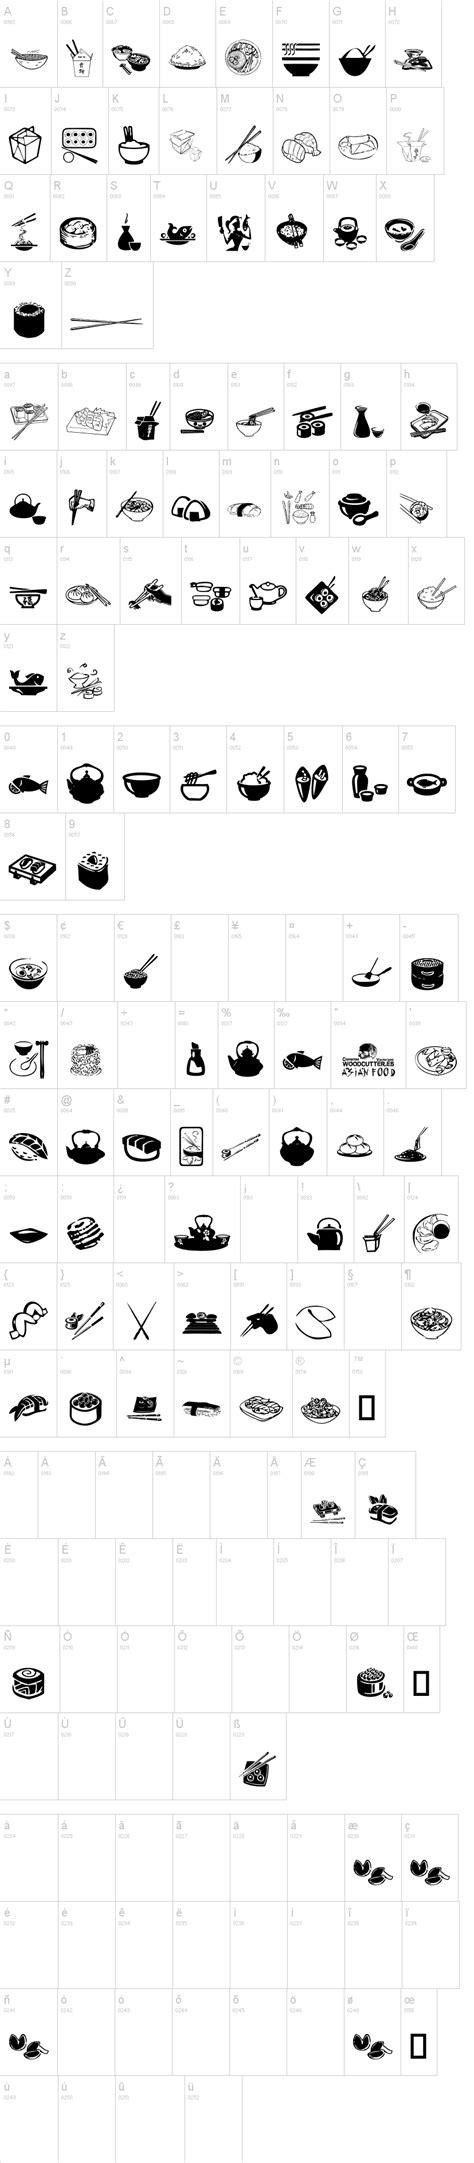 Dafont Food | asian food font dafont com